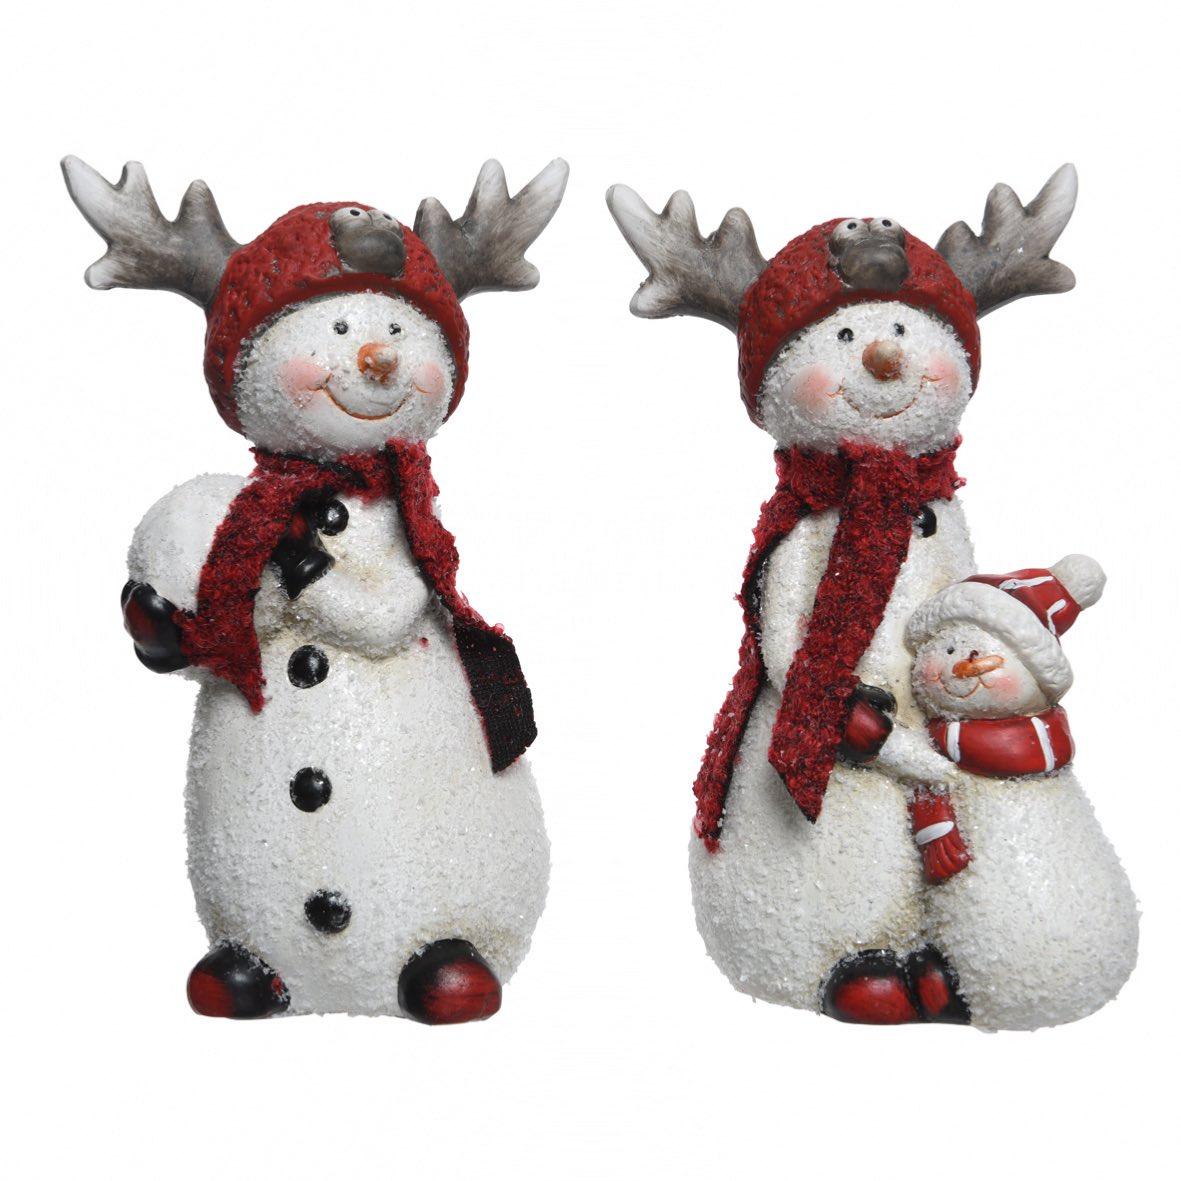 bonhommes de neige en terre cuite